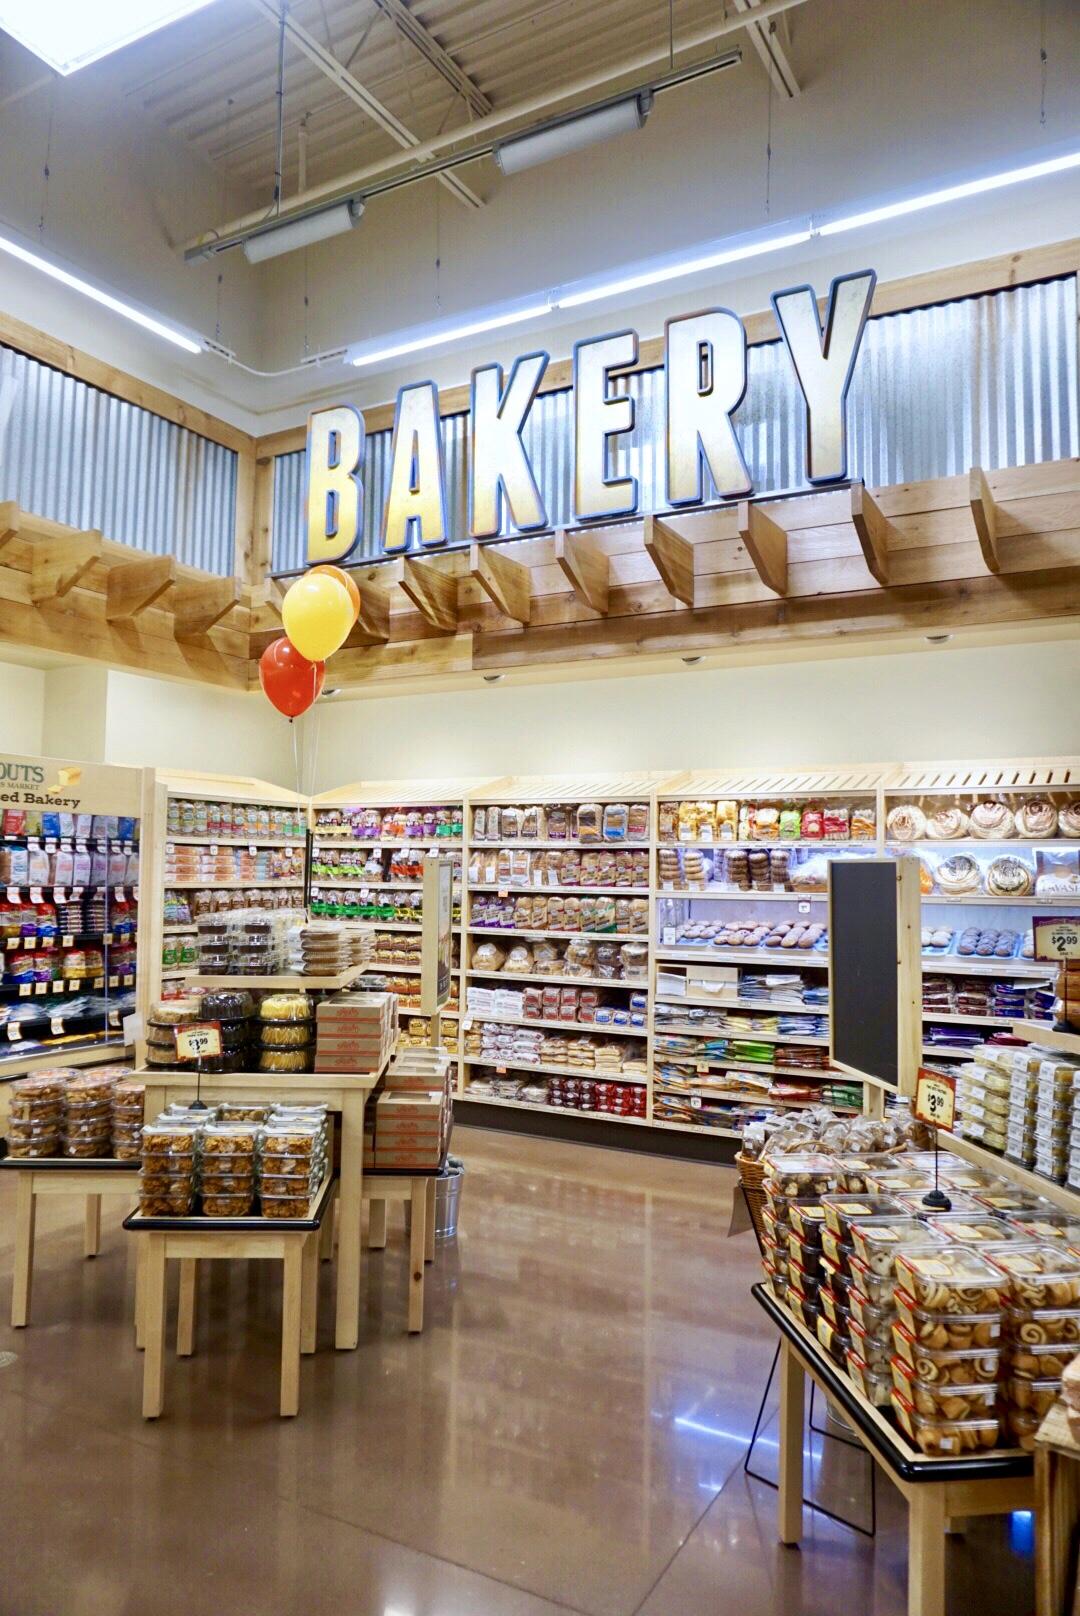 sprouts-ellicott-city-maryland-bakery.jpg